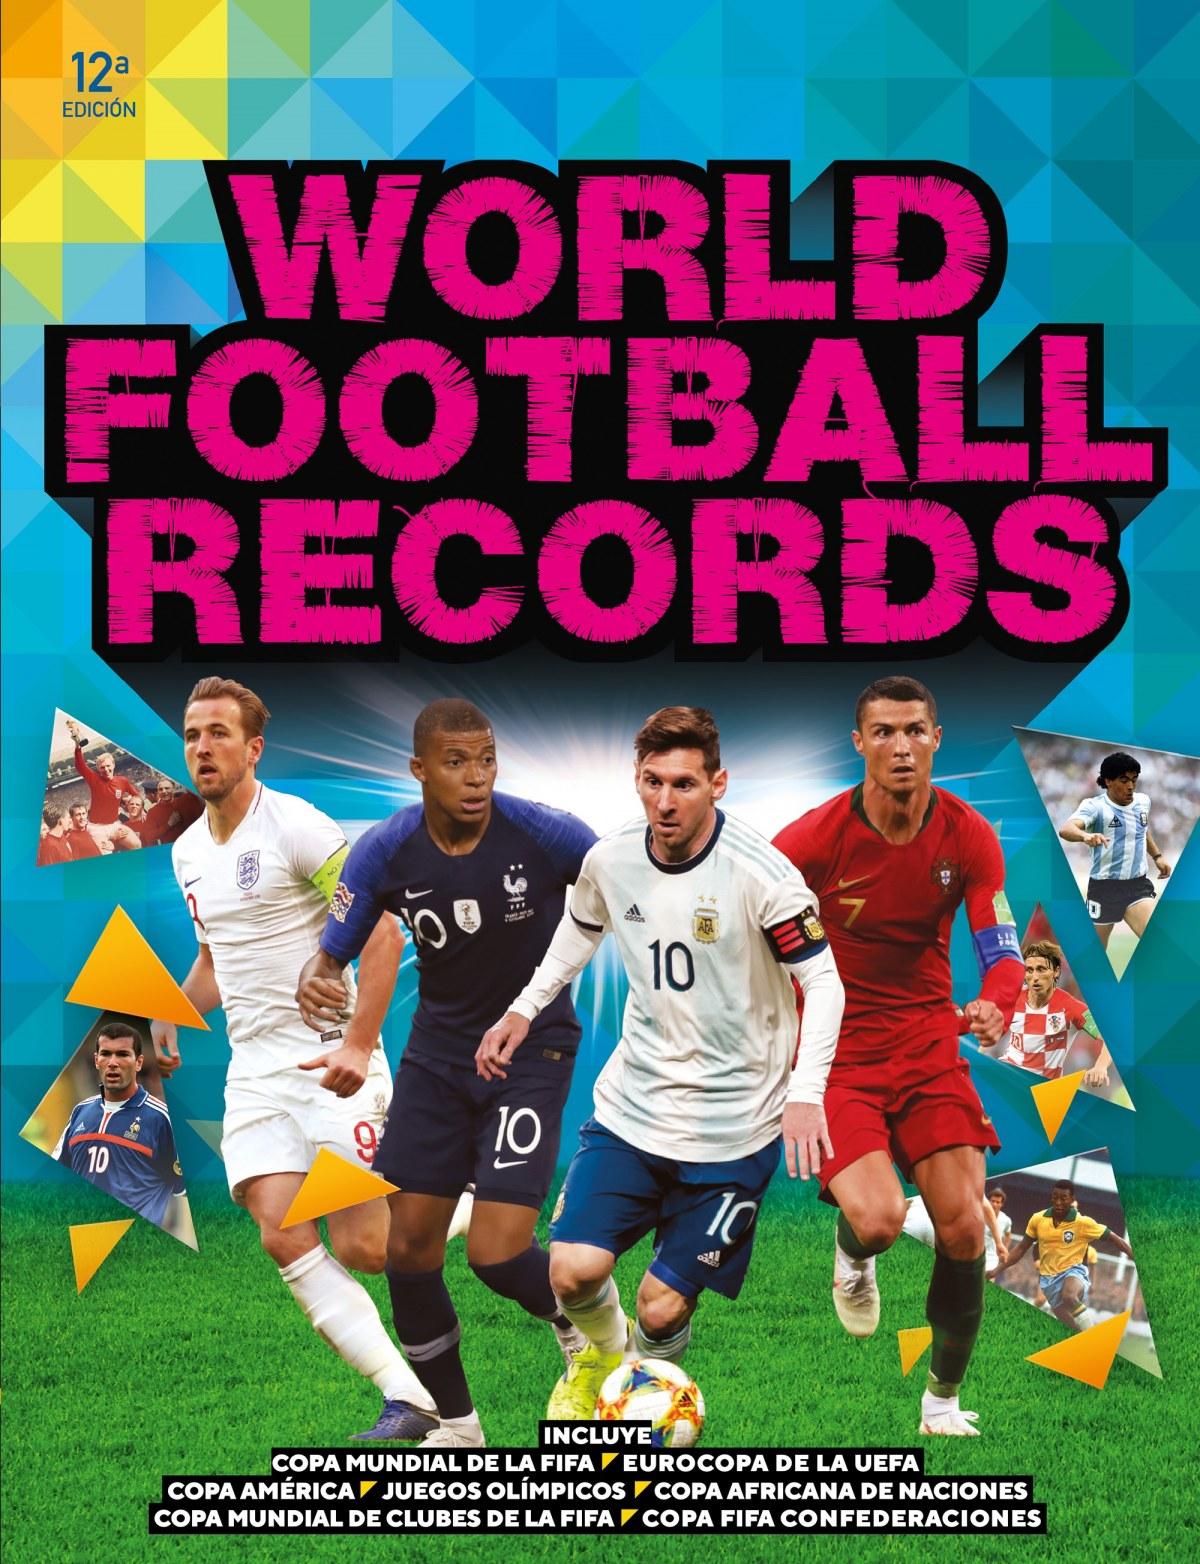 WORLD FOOTBALL RECORDS 2019 9788417922184